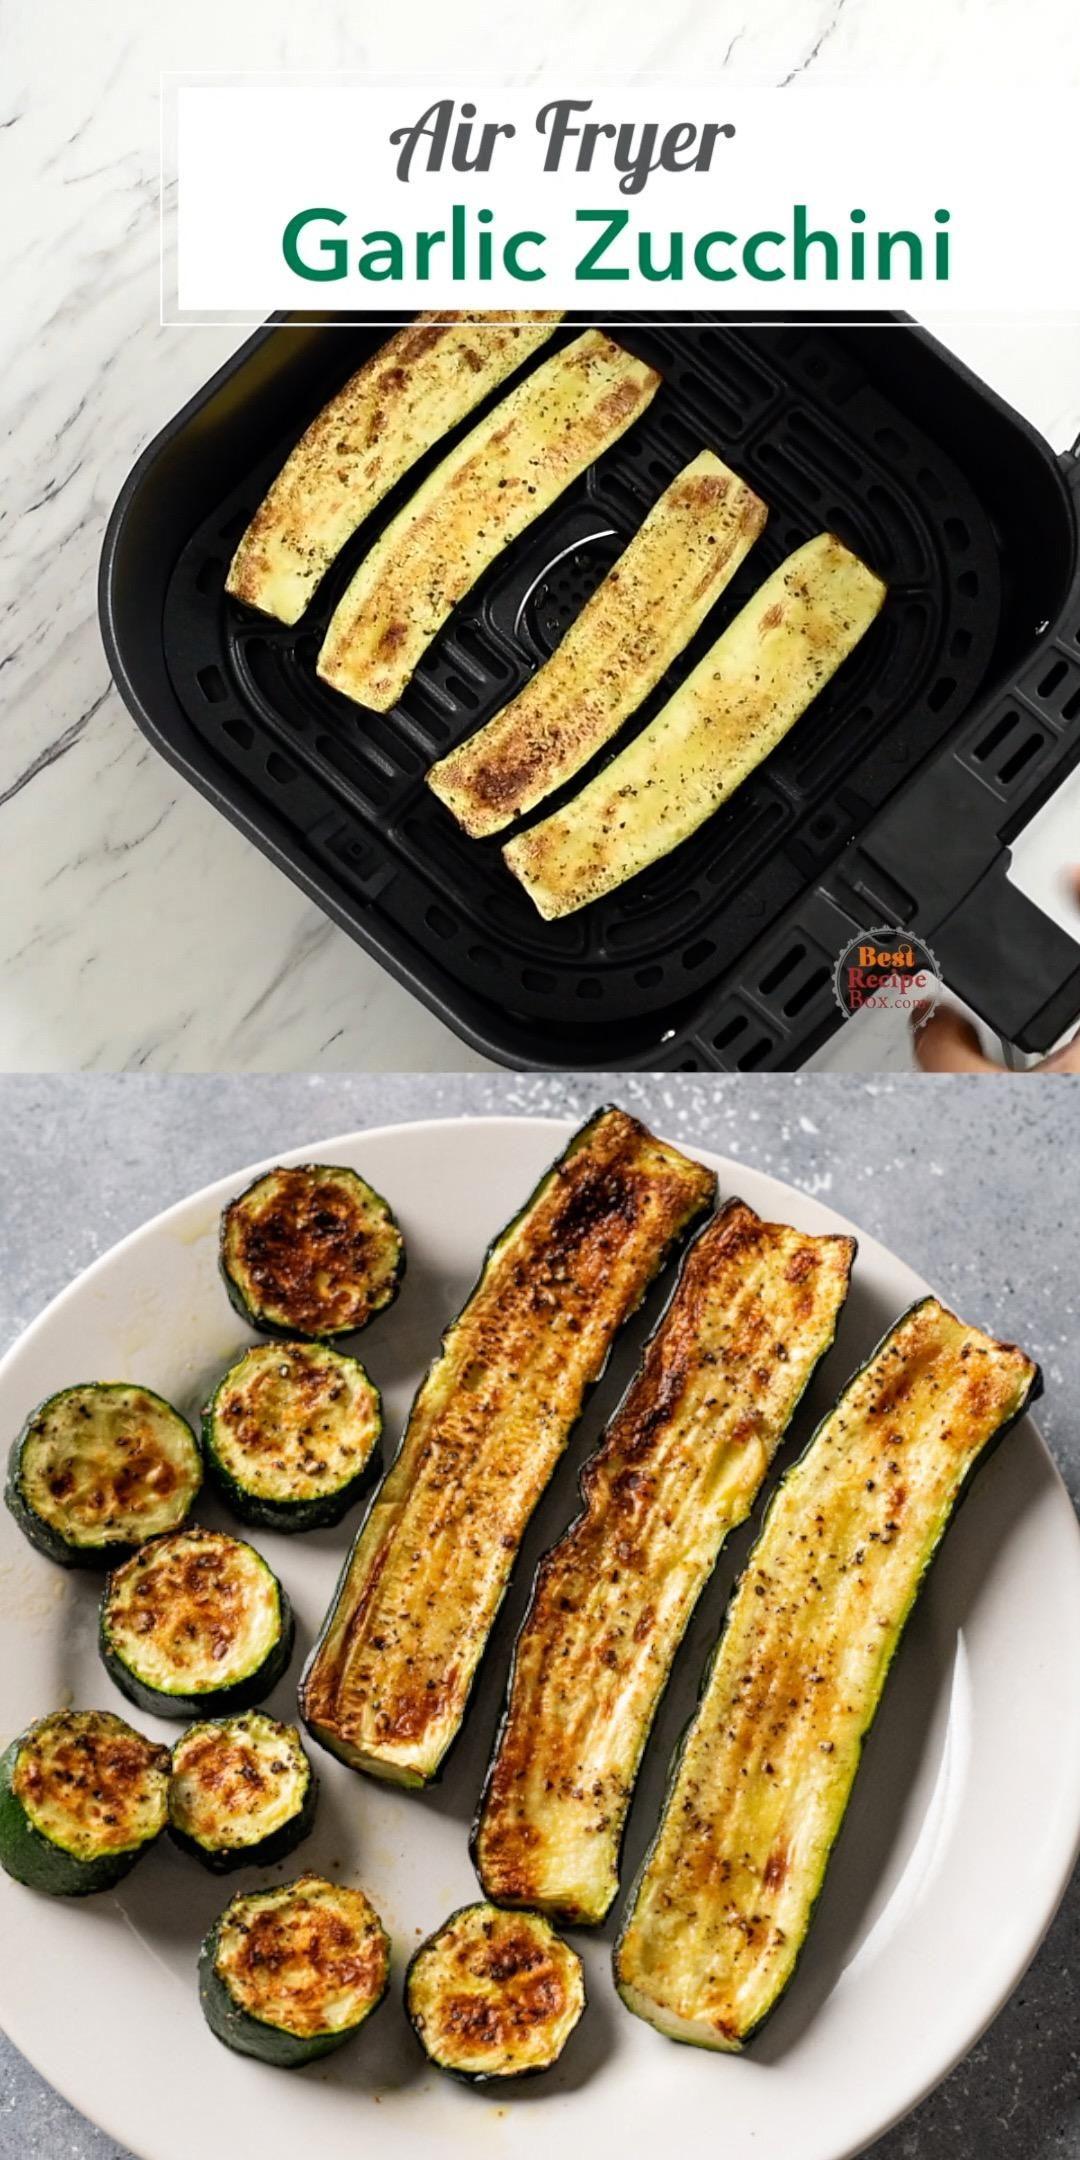 Healthy Air Fryer Garlic Zucchini -   19 air fryer recipes healthy low calorie ideas